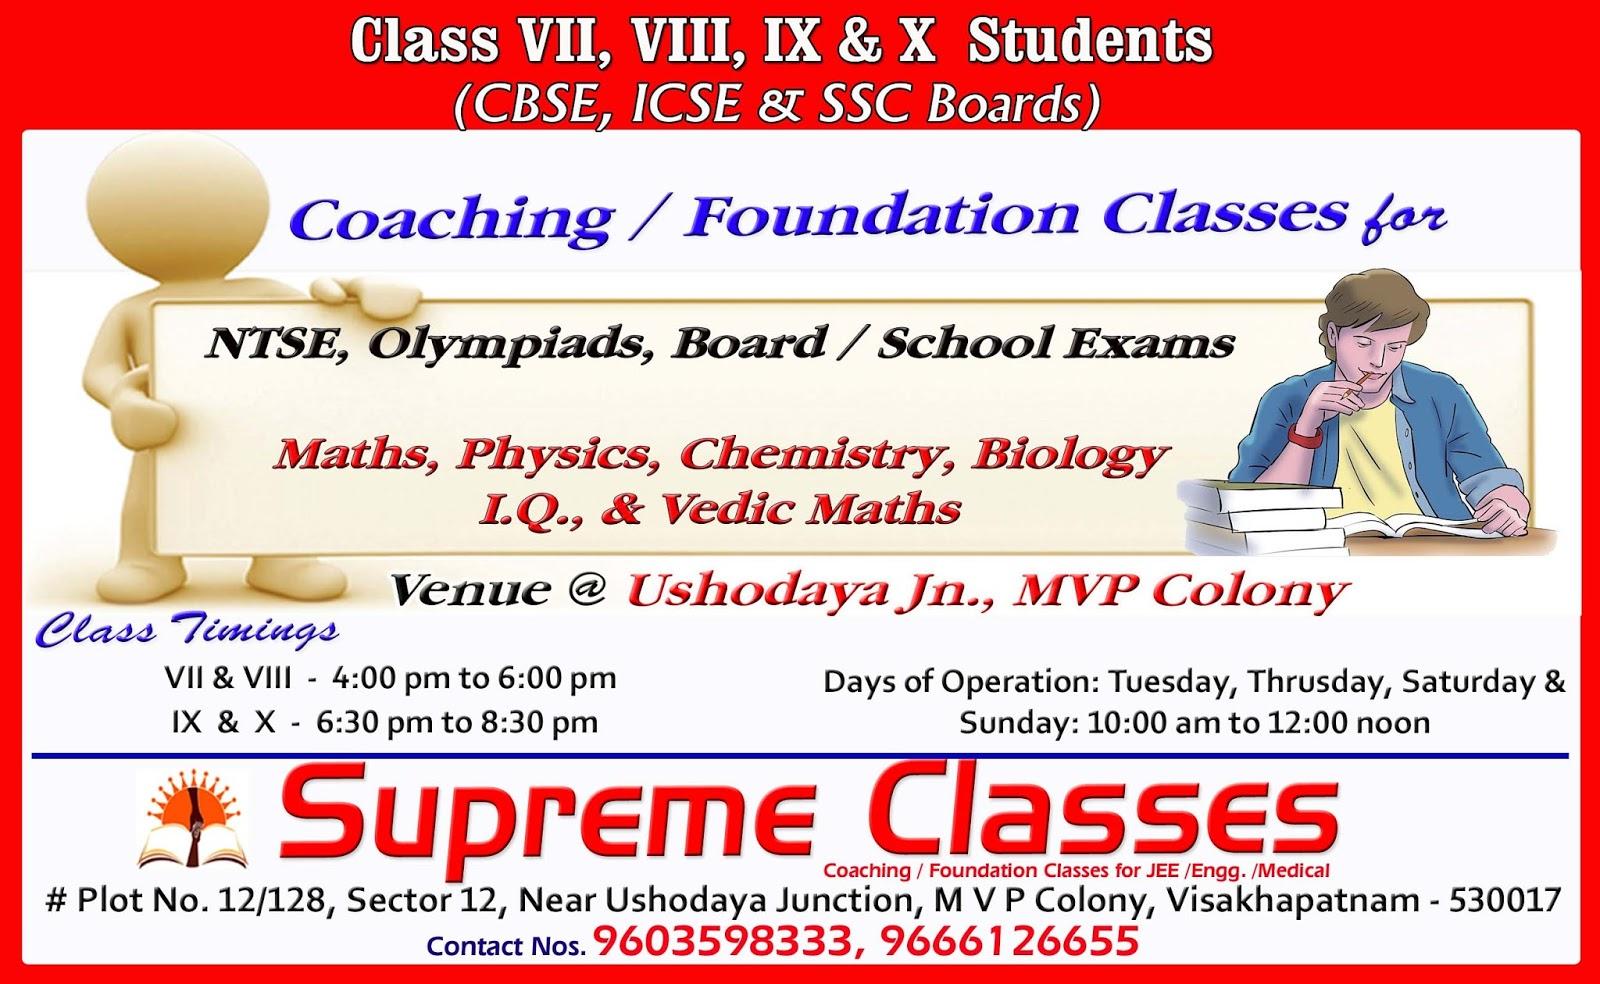 SUPREME CLASSES @ VIZAG : Class 7, 8, 9 & 10 Students